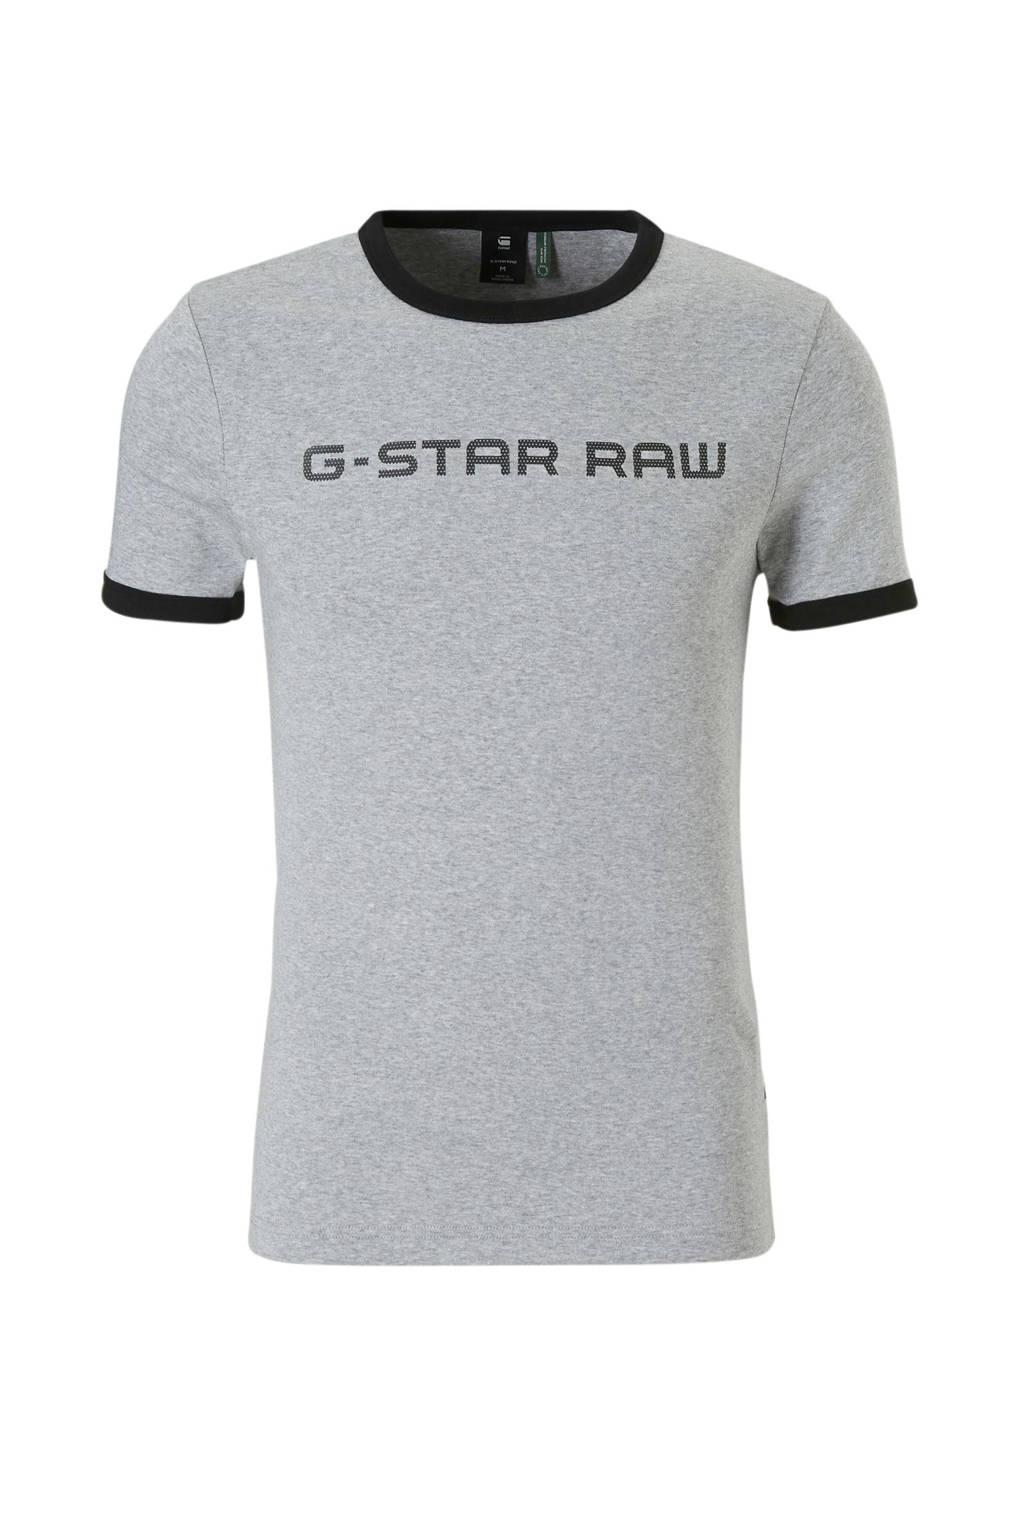 G-Star RAW T-shirt Xemoj, Grijs melange